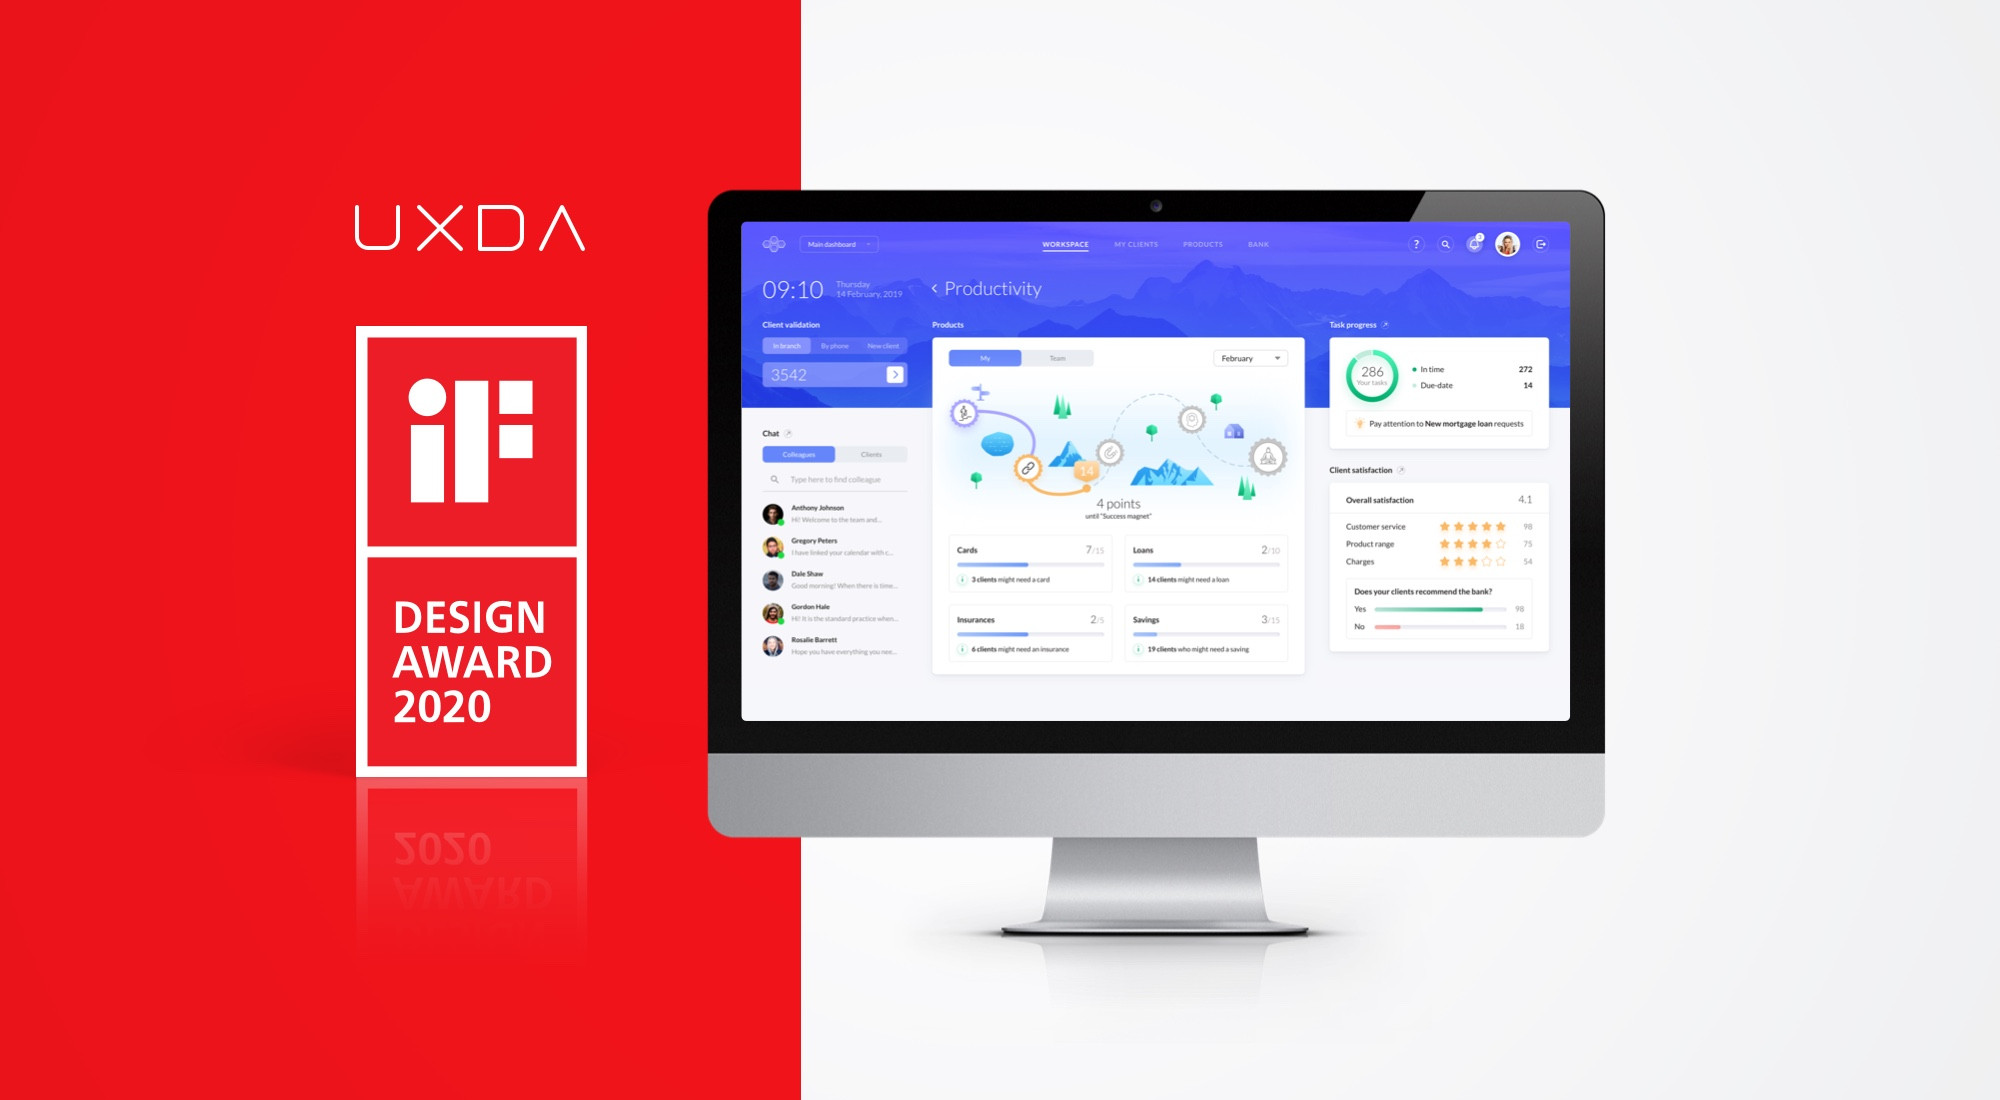 uxda-core-banking-ux-wins-if-award-hero-blog-2000-1__2000.jpg